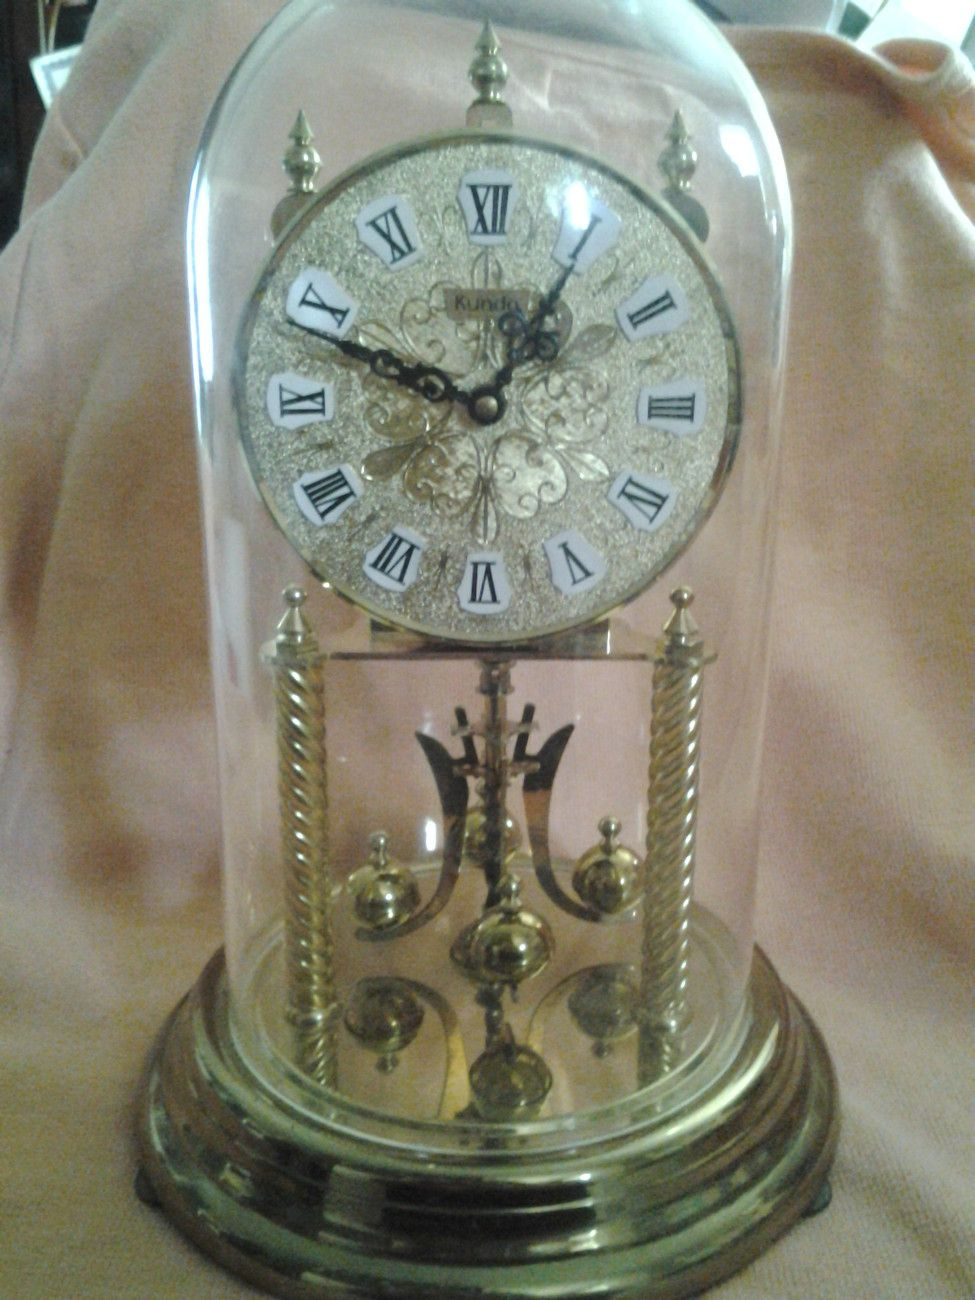 7a3fe2bc9e3 Kundo Anniversary Clock Made in West Germany.